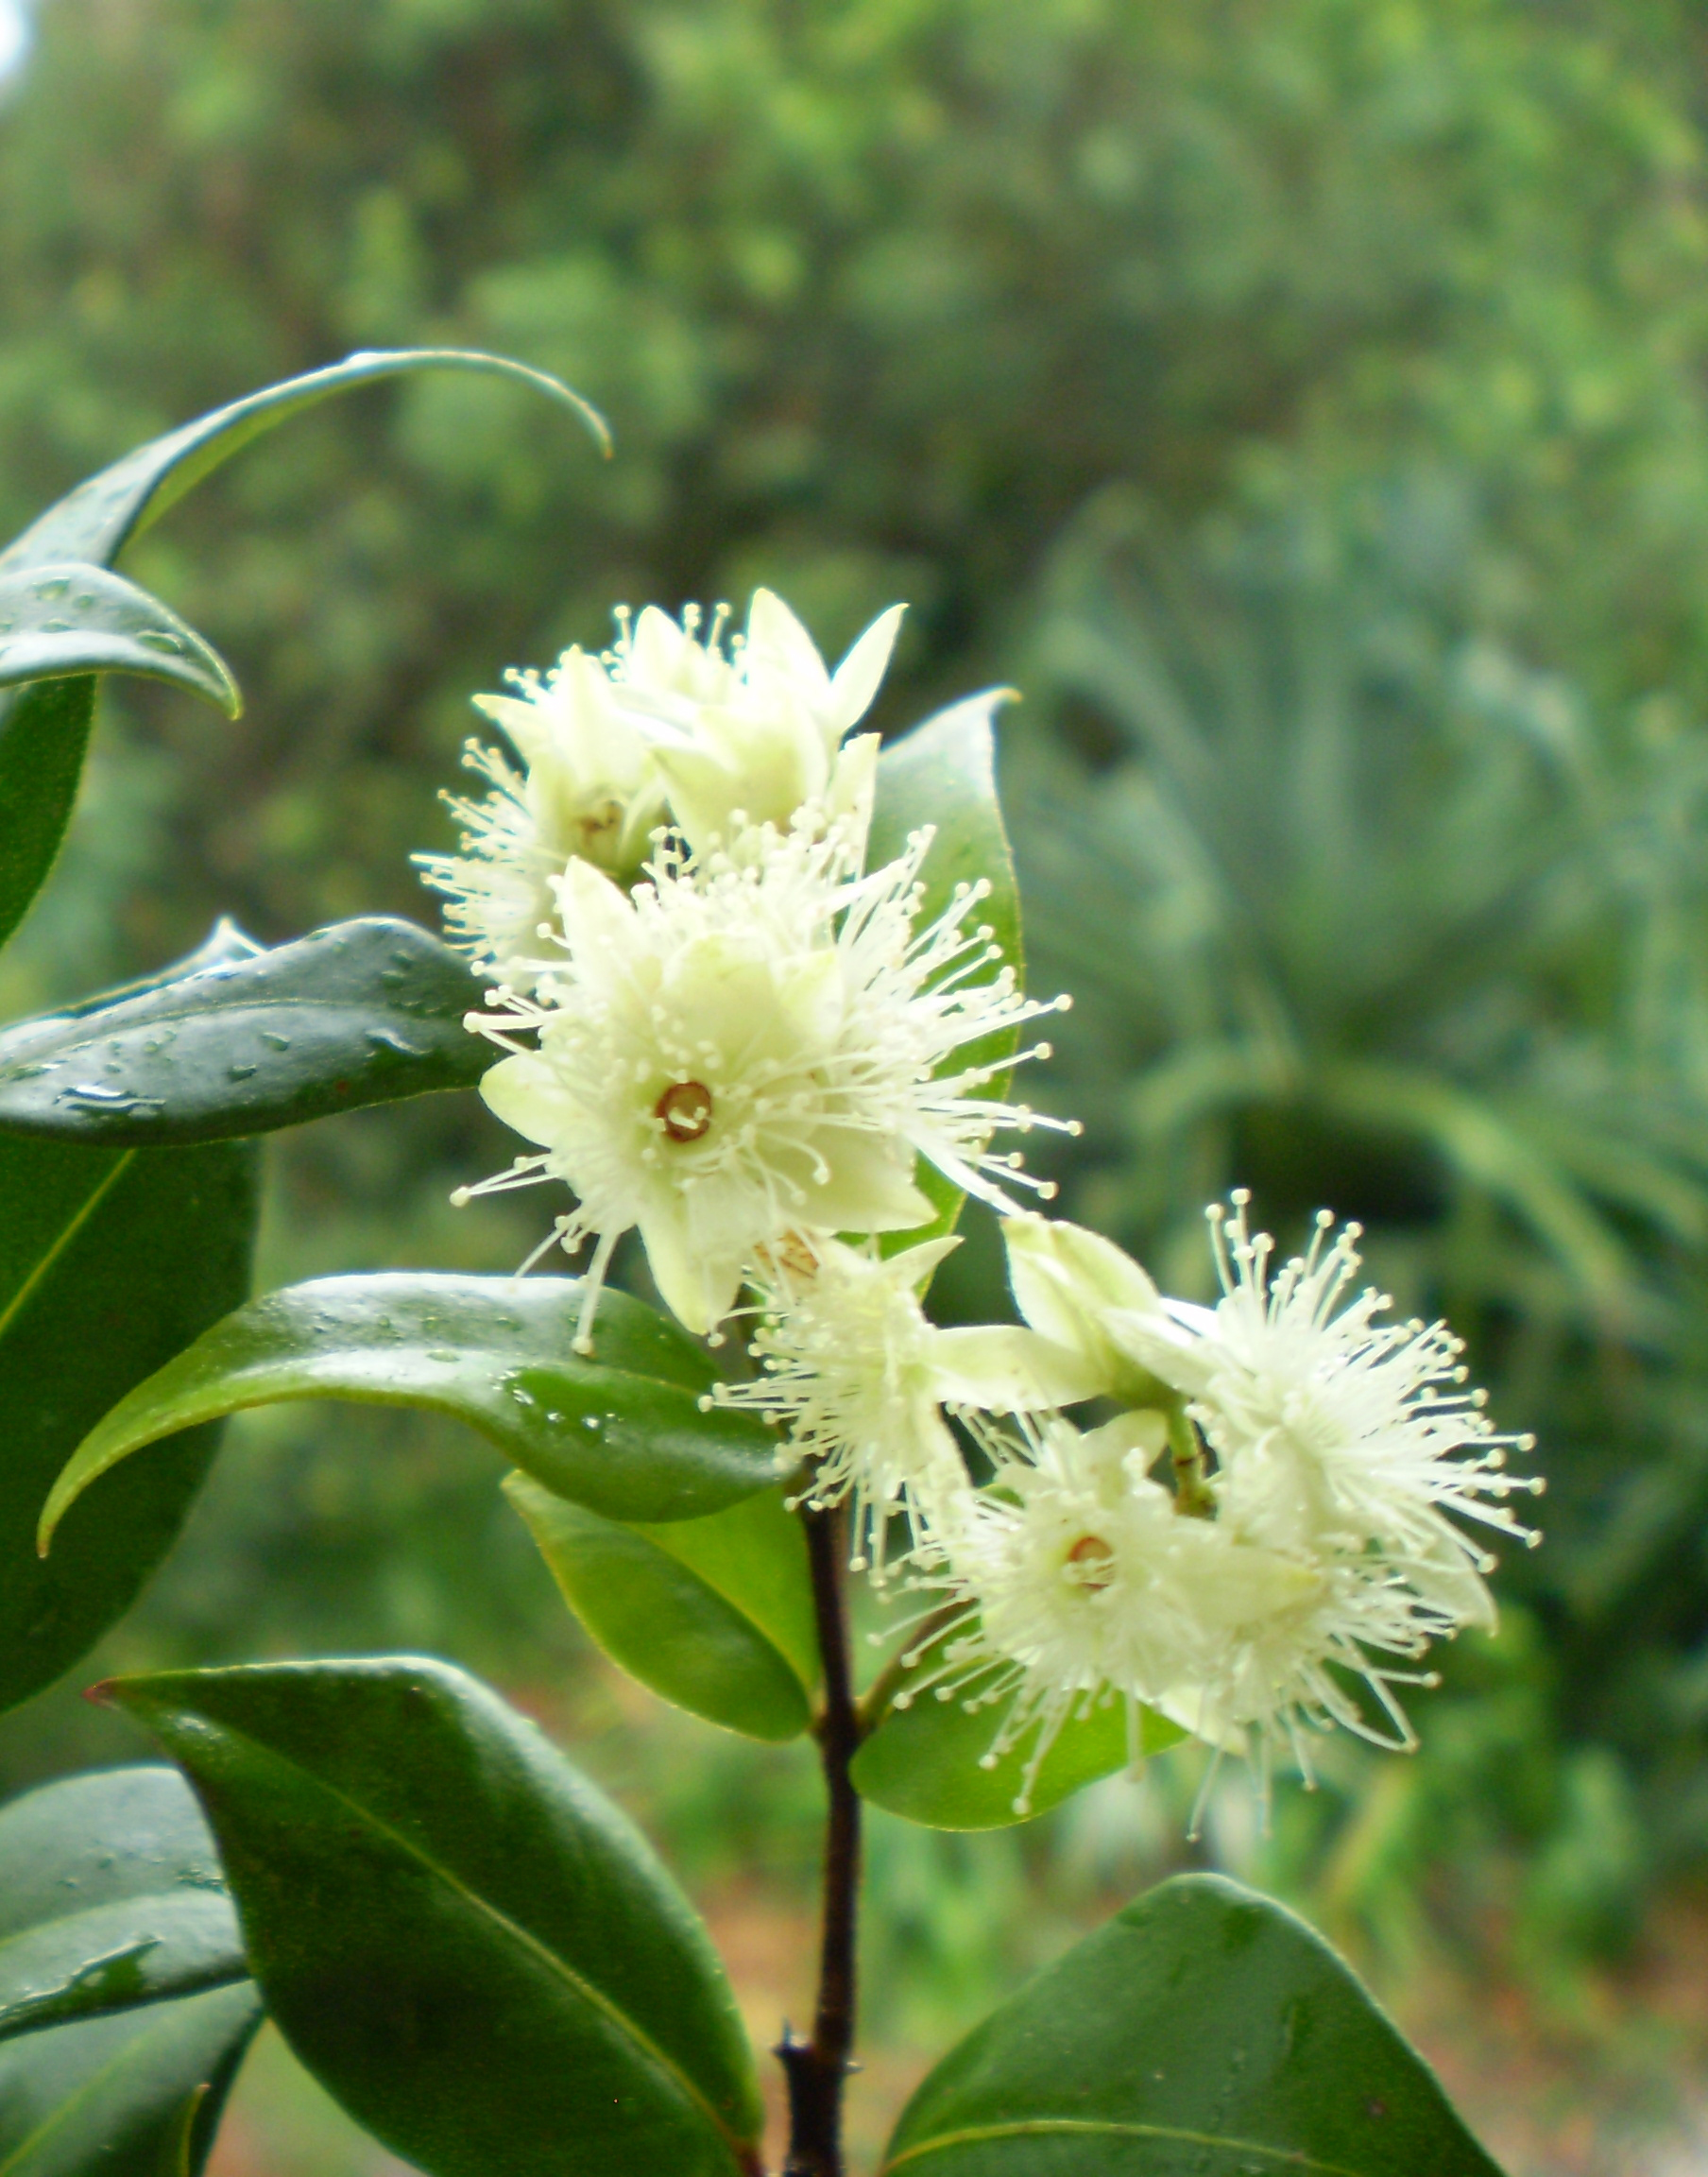 Close-up-flower-of-Cinnamon